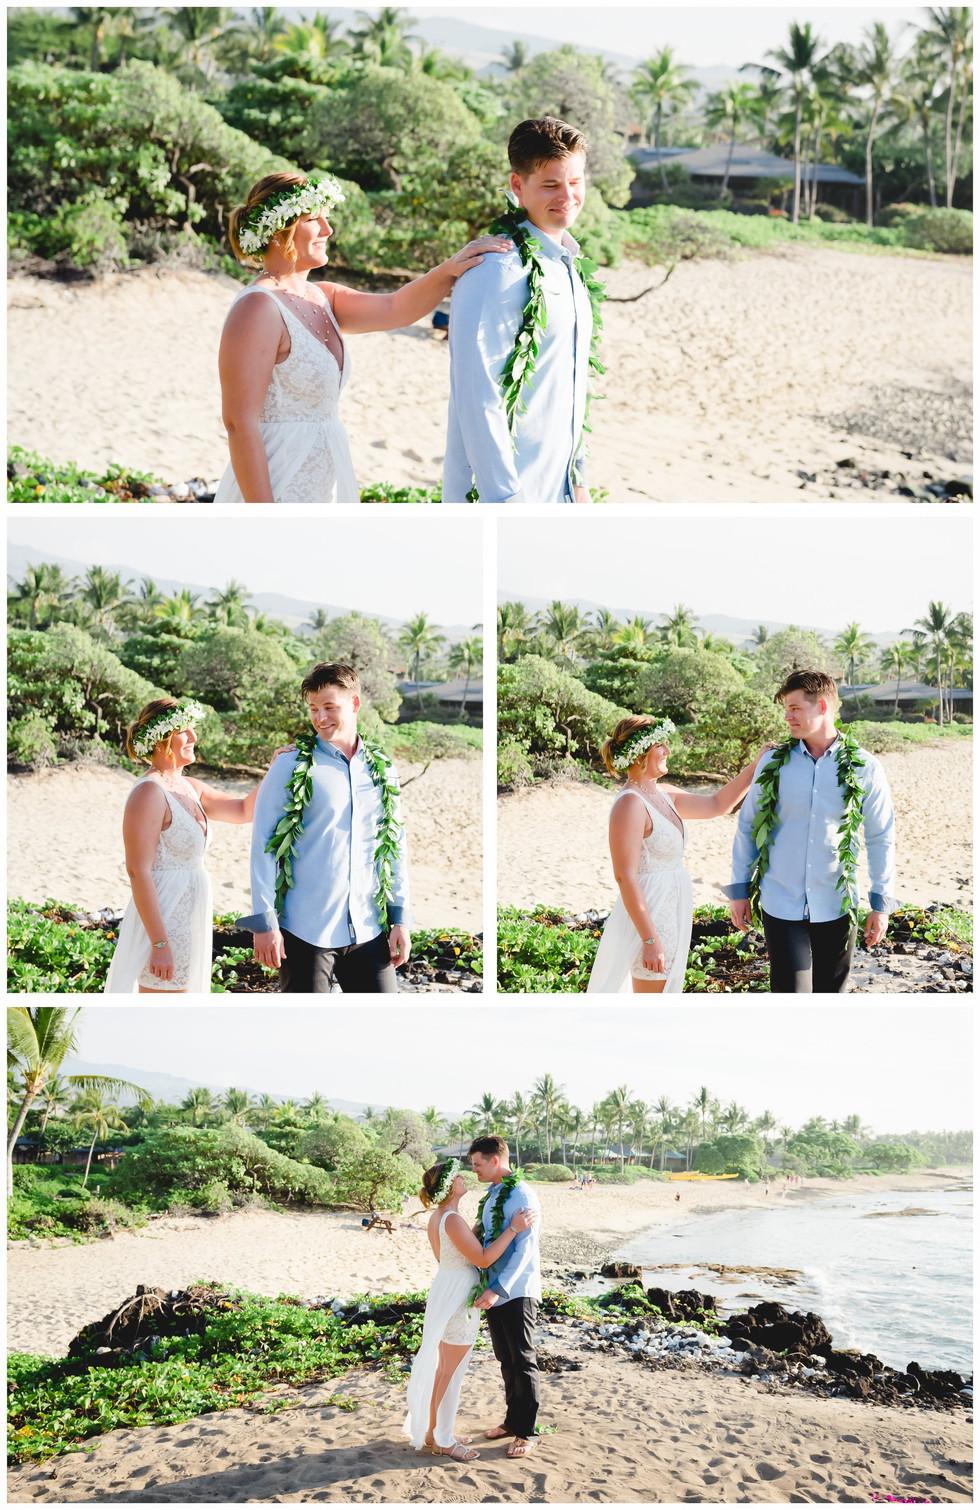 Hawaii Beach Weddings-1-2.jpg